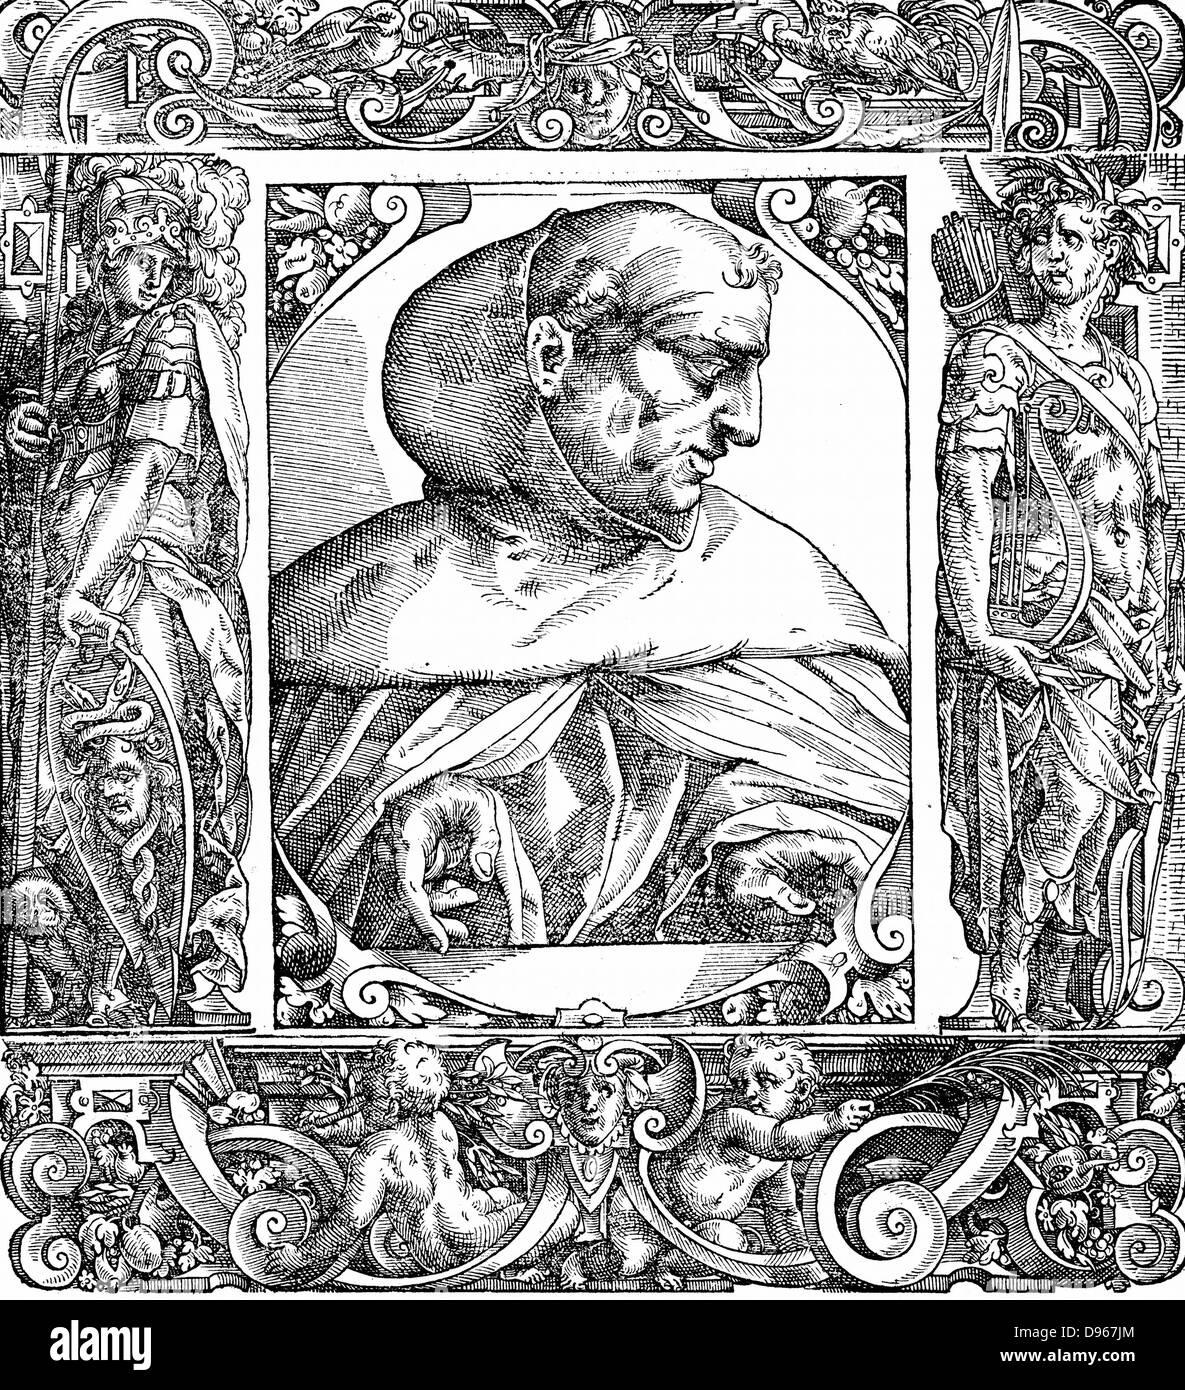 Albertus Magnus (c1200-1280) Italian Dominican friar called 'Doctor Universalis'. Bishop of Ratisbon, 1260. Melded Stock Photo